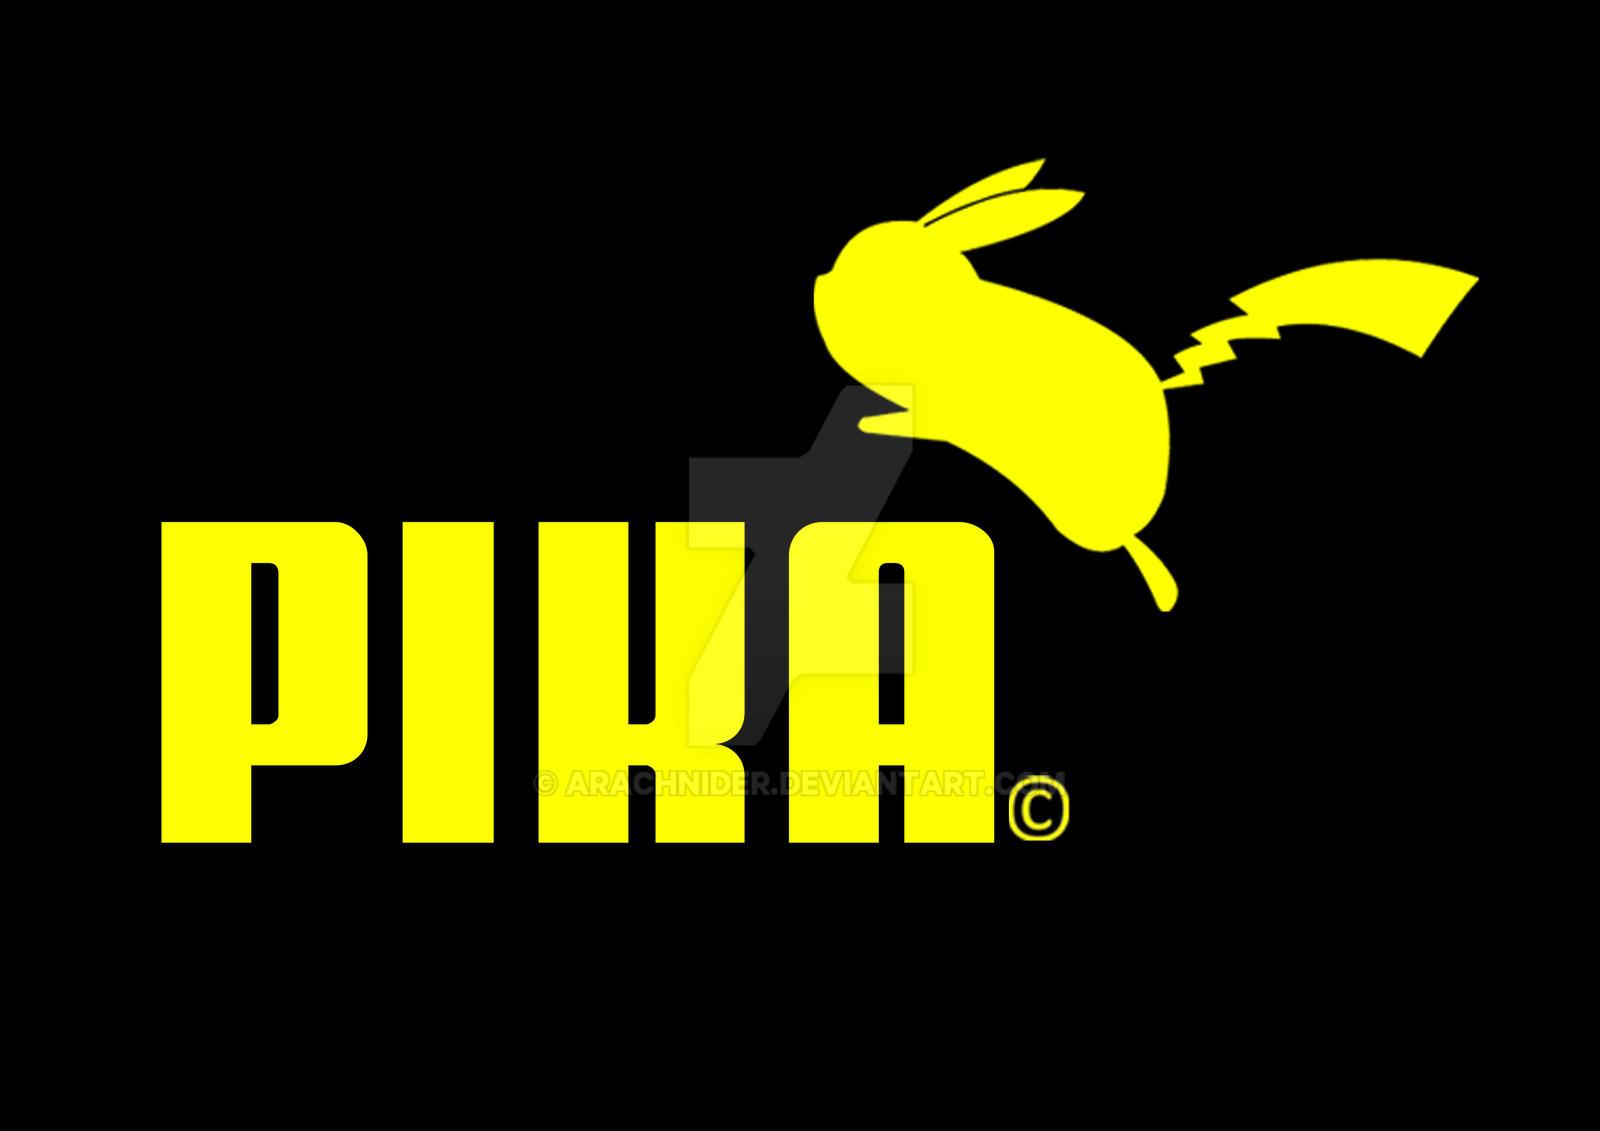 pikachu puma style by arachnider on deviantart puma logo vector ai puma logo vector ai